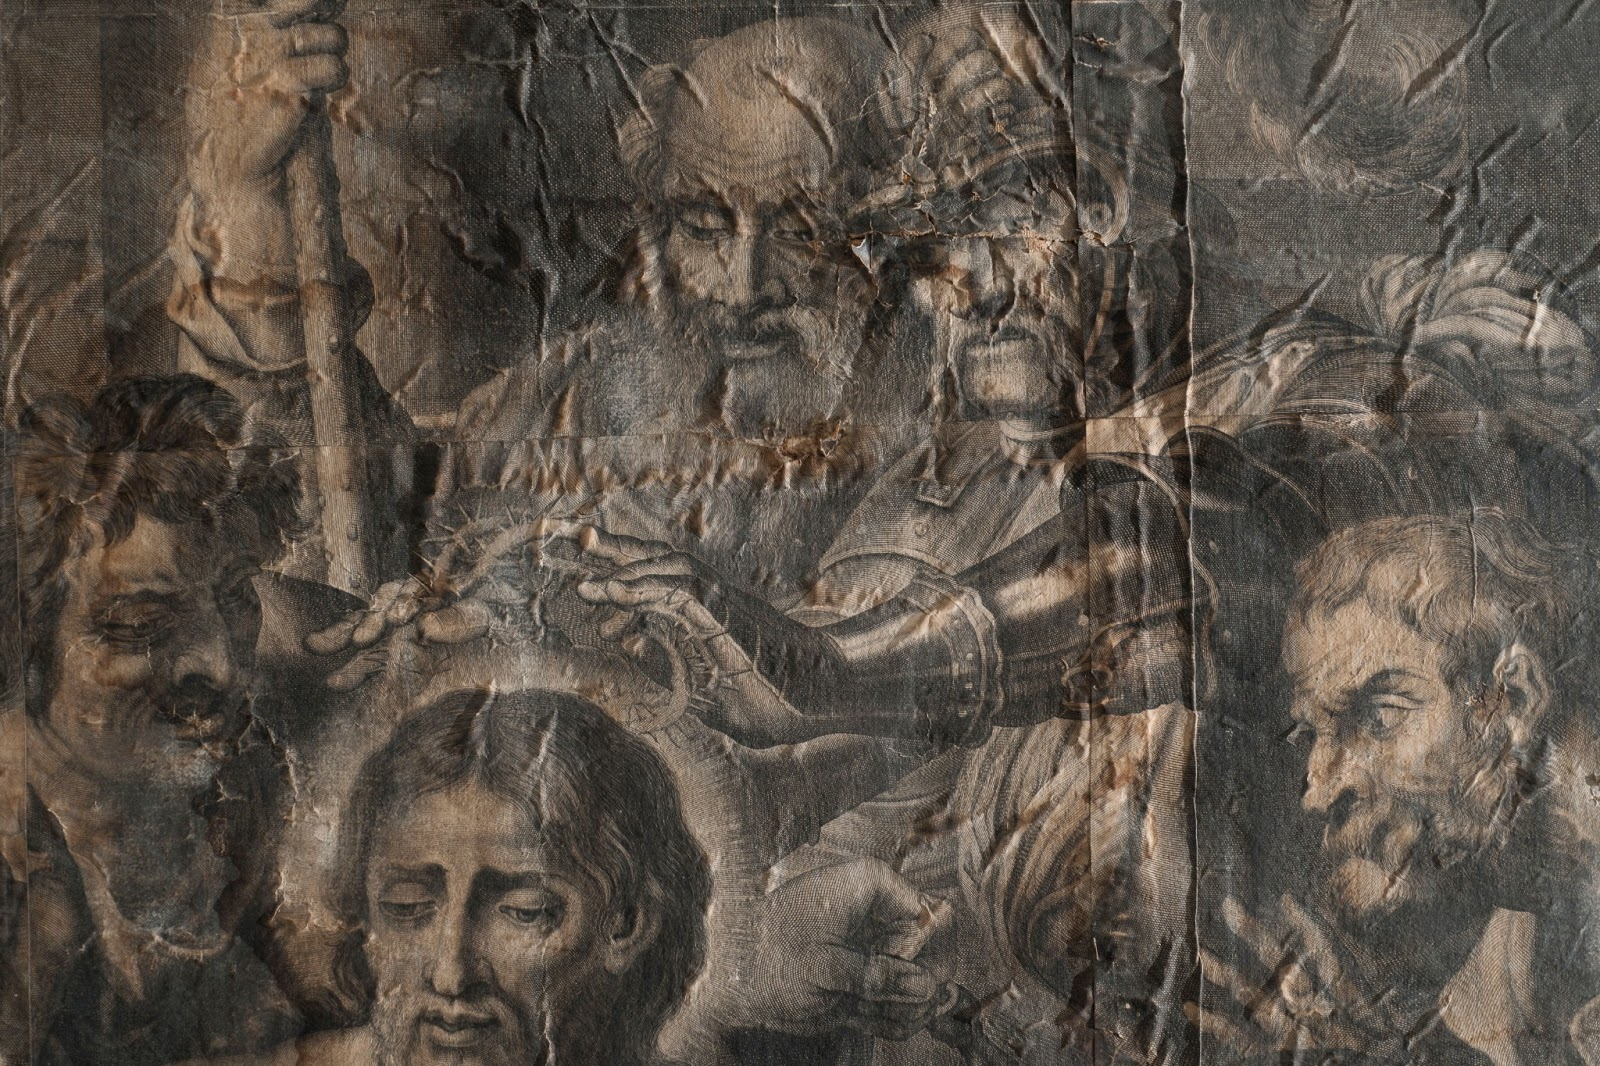 http://rfacdn.nz/artgallery/assets/media/blog-mocking-christ-5.jpg